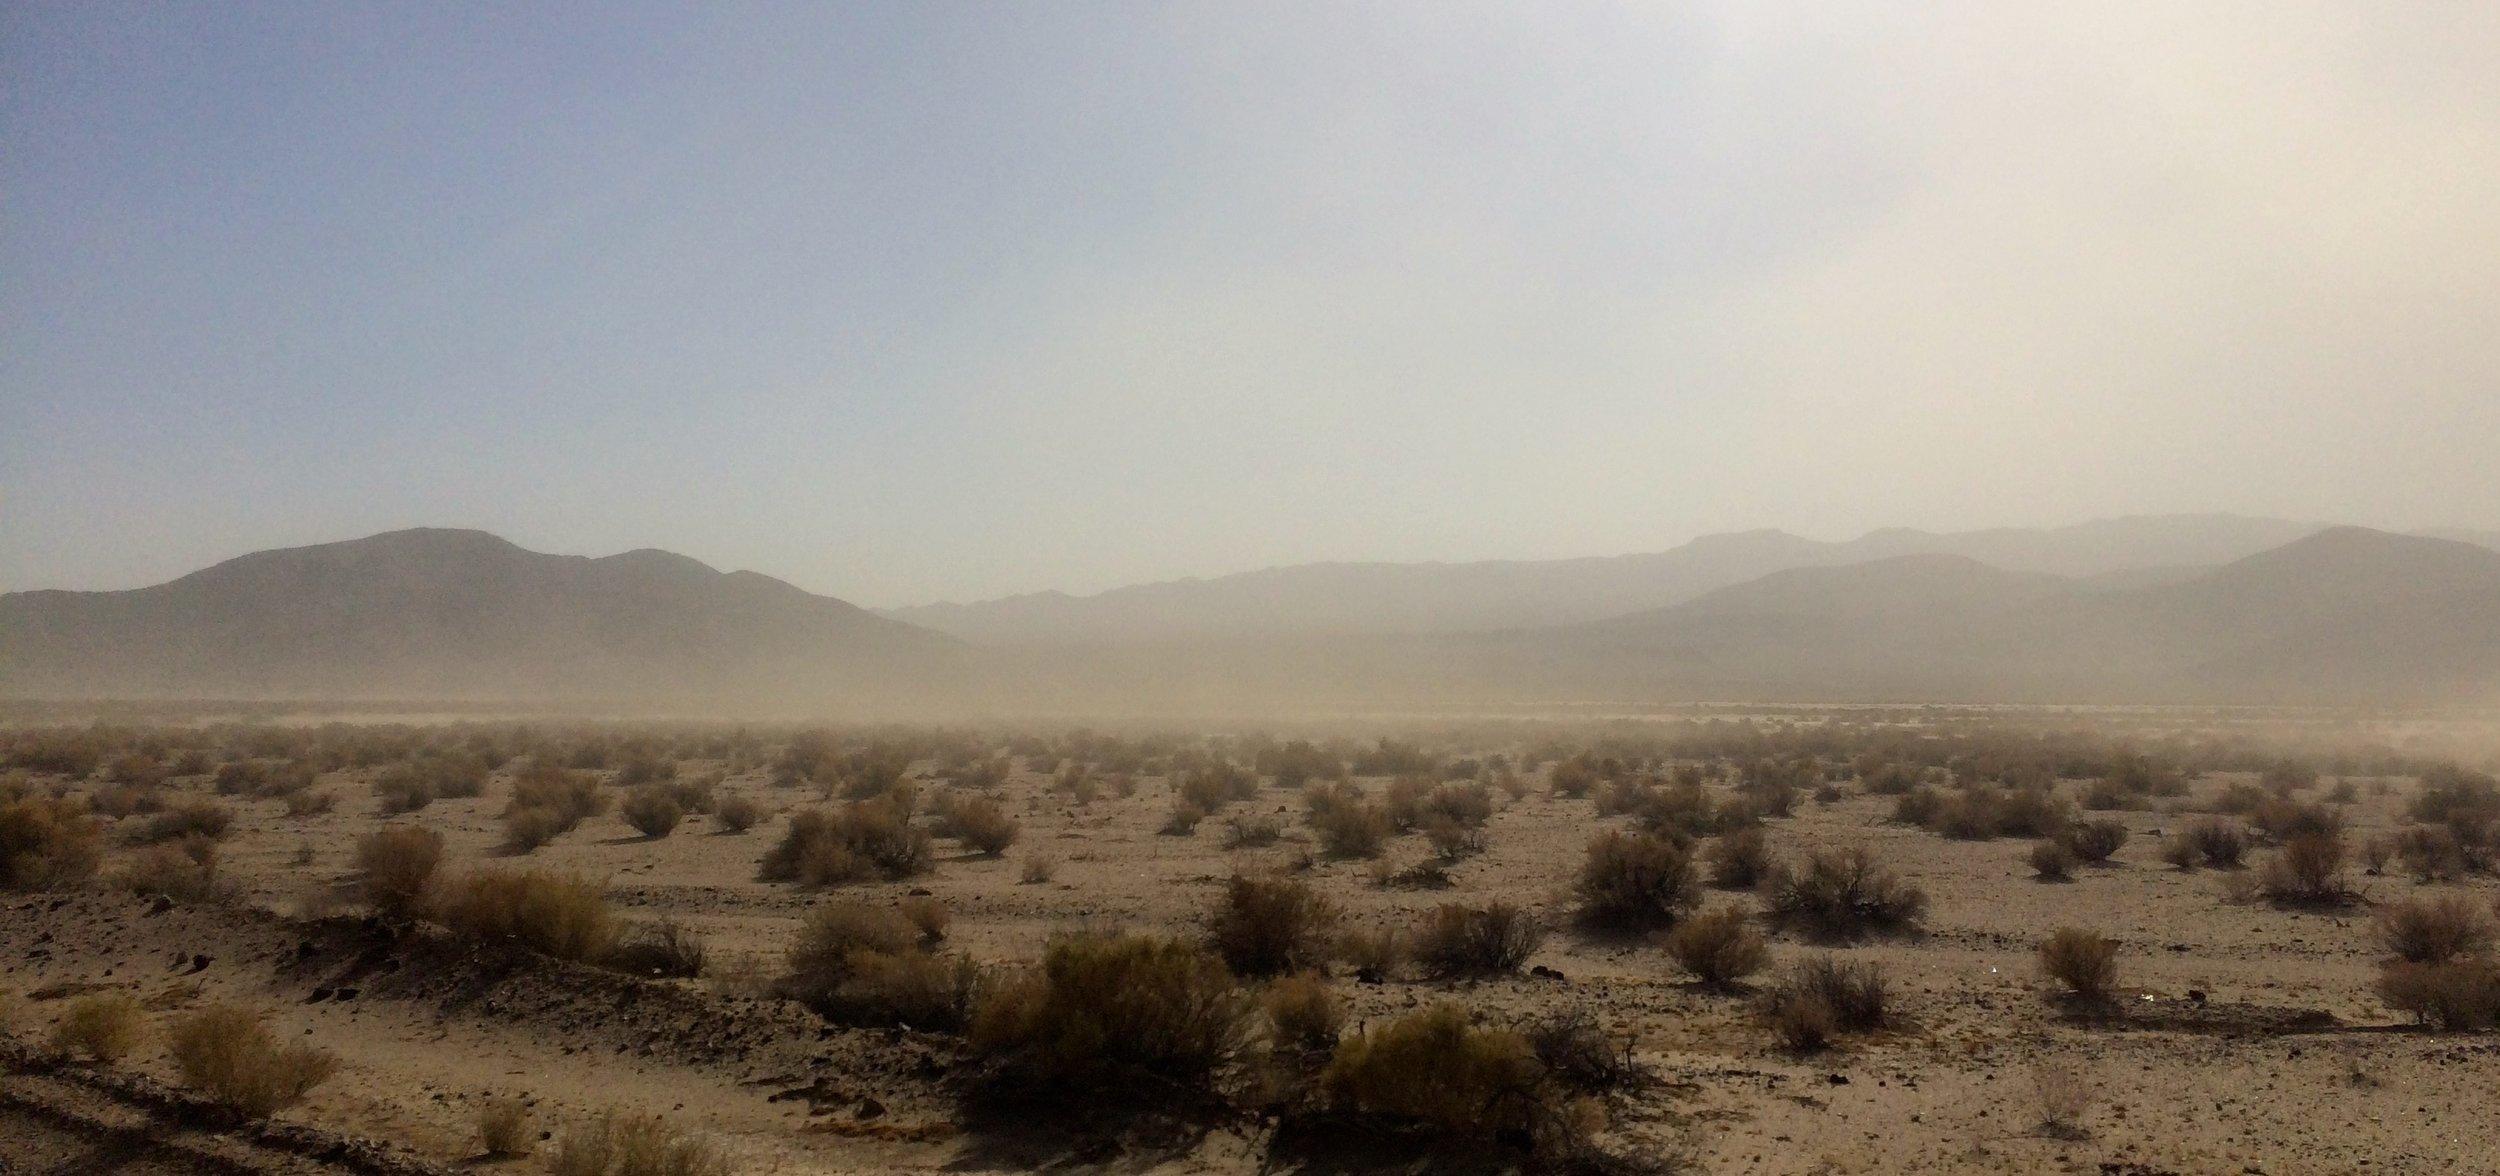 Mojaven aavikolla tuulee.